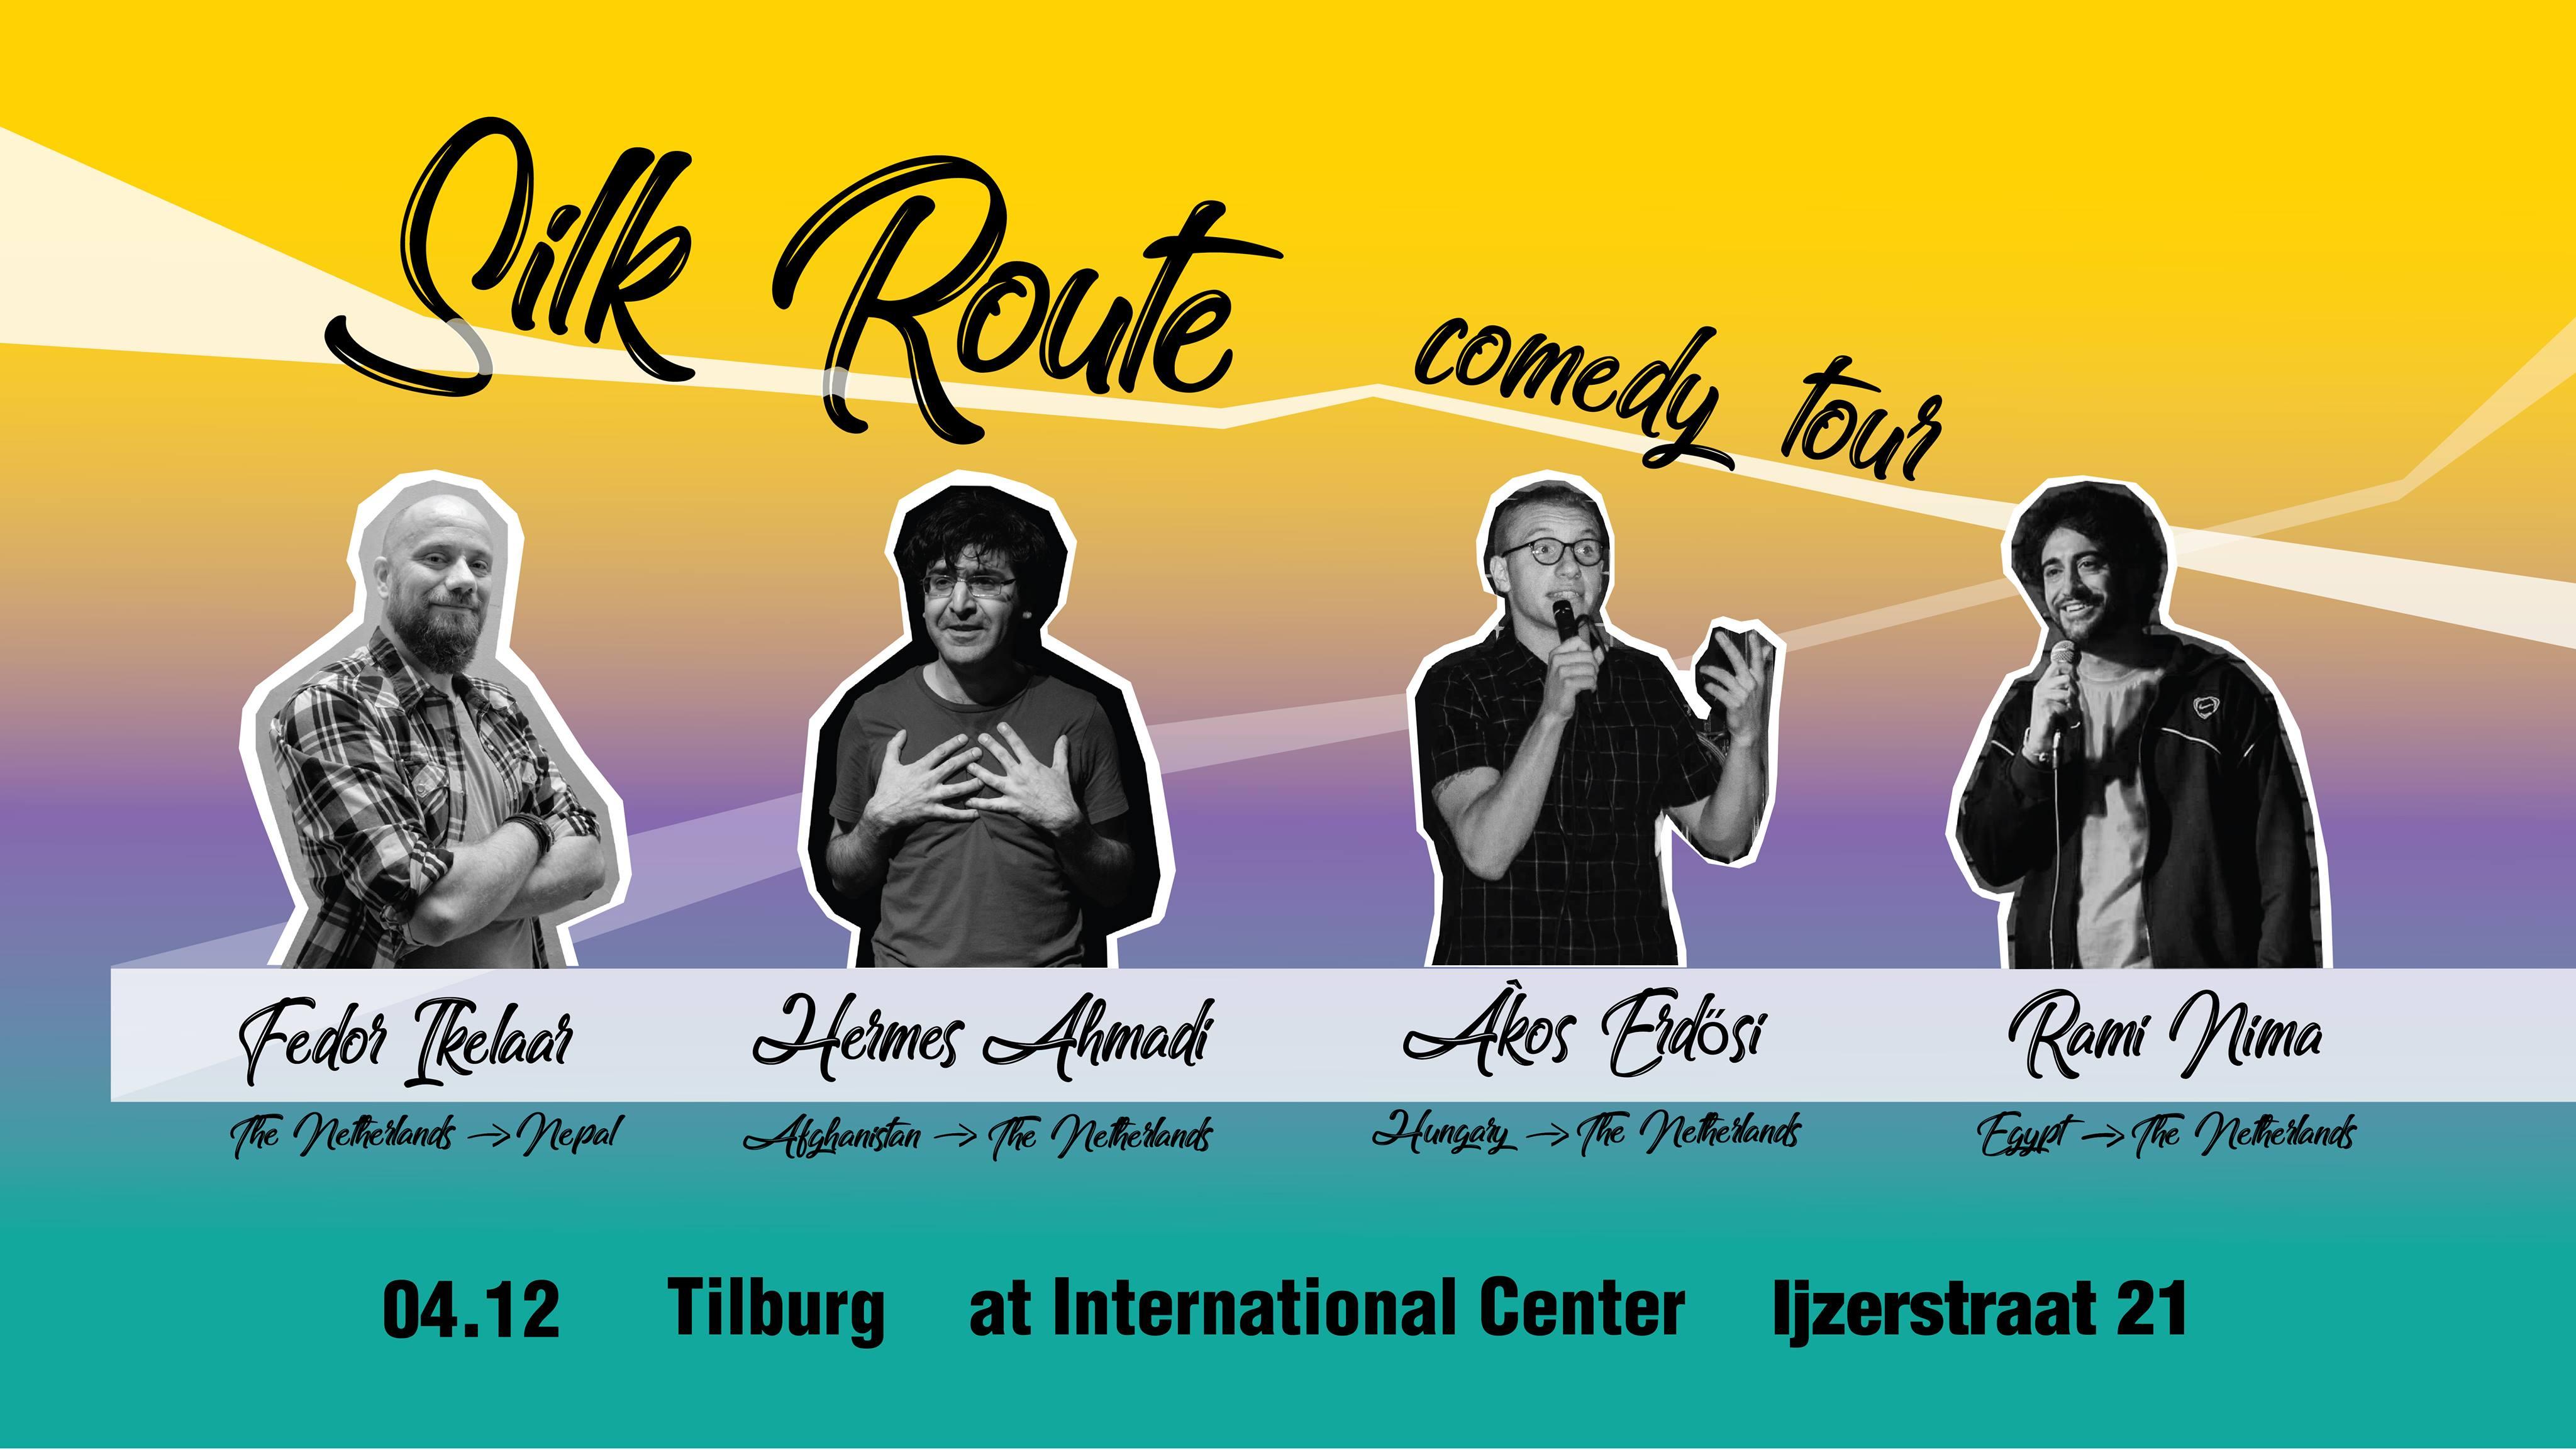 Ticket kopen voor evenement Silk Route Comedy Tour at International Center Tilburg